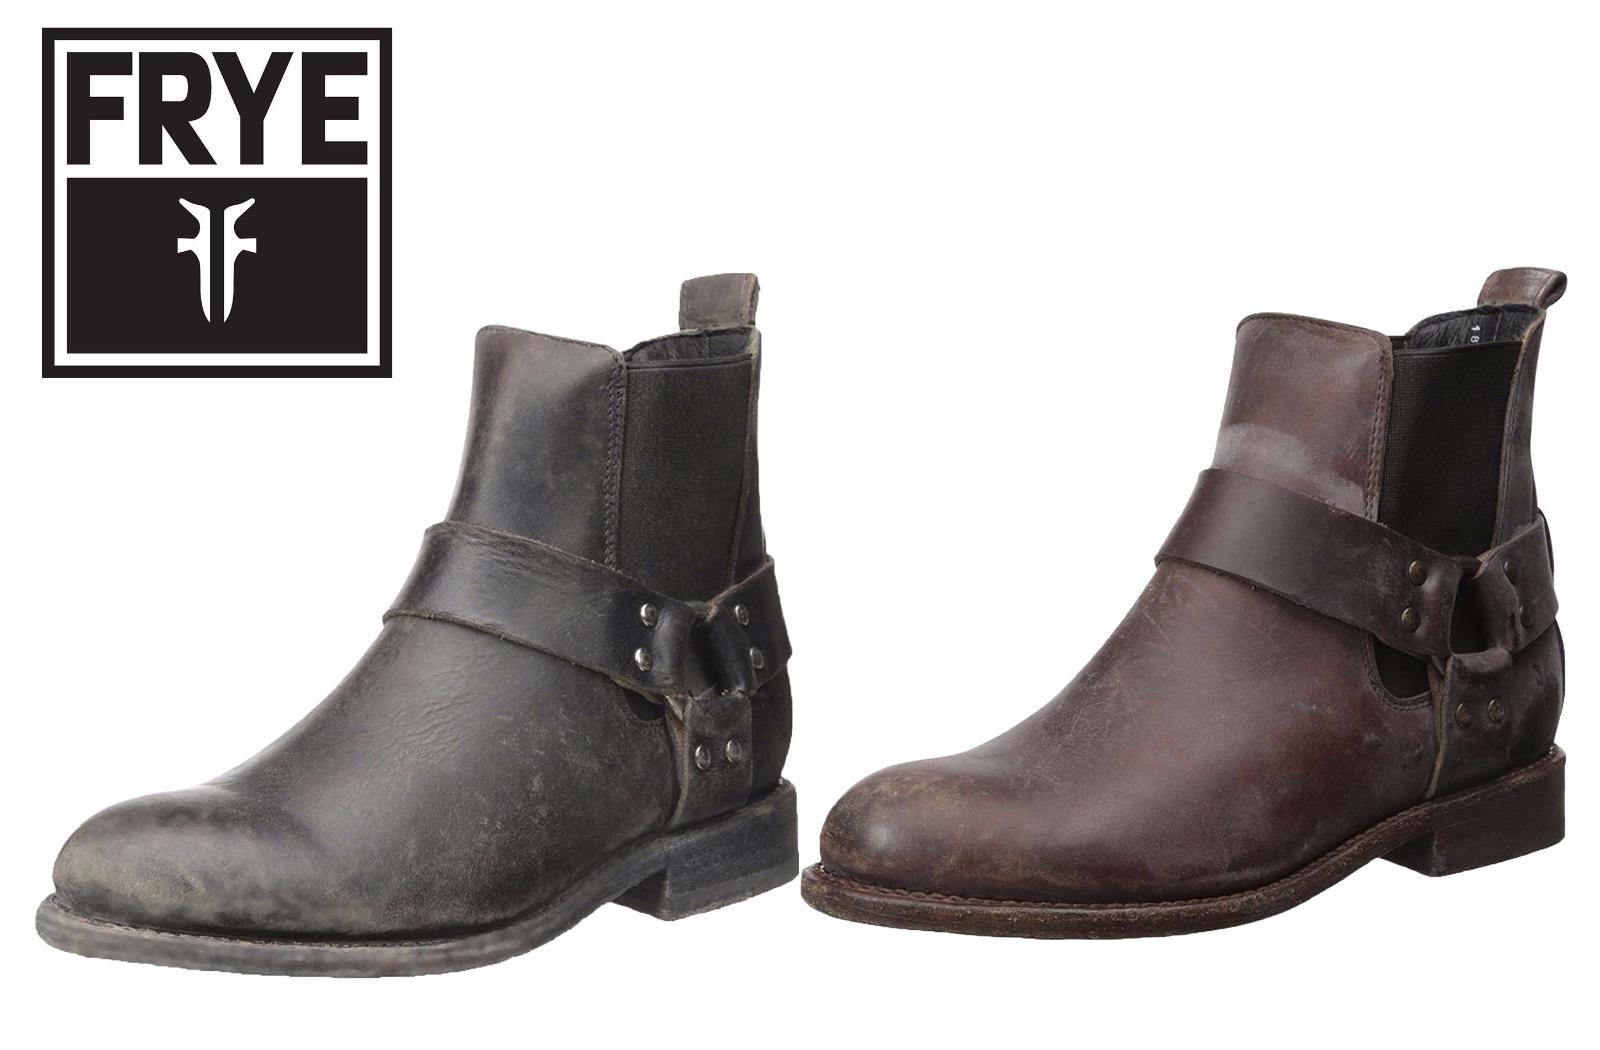 FRYE Women's Jayden Harness Chelsea Boot